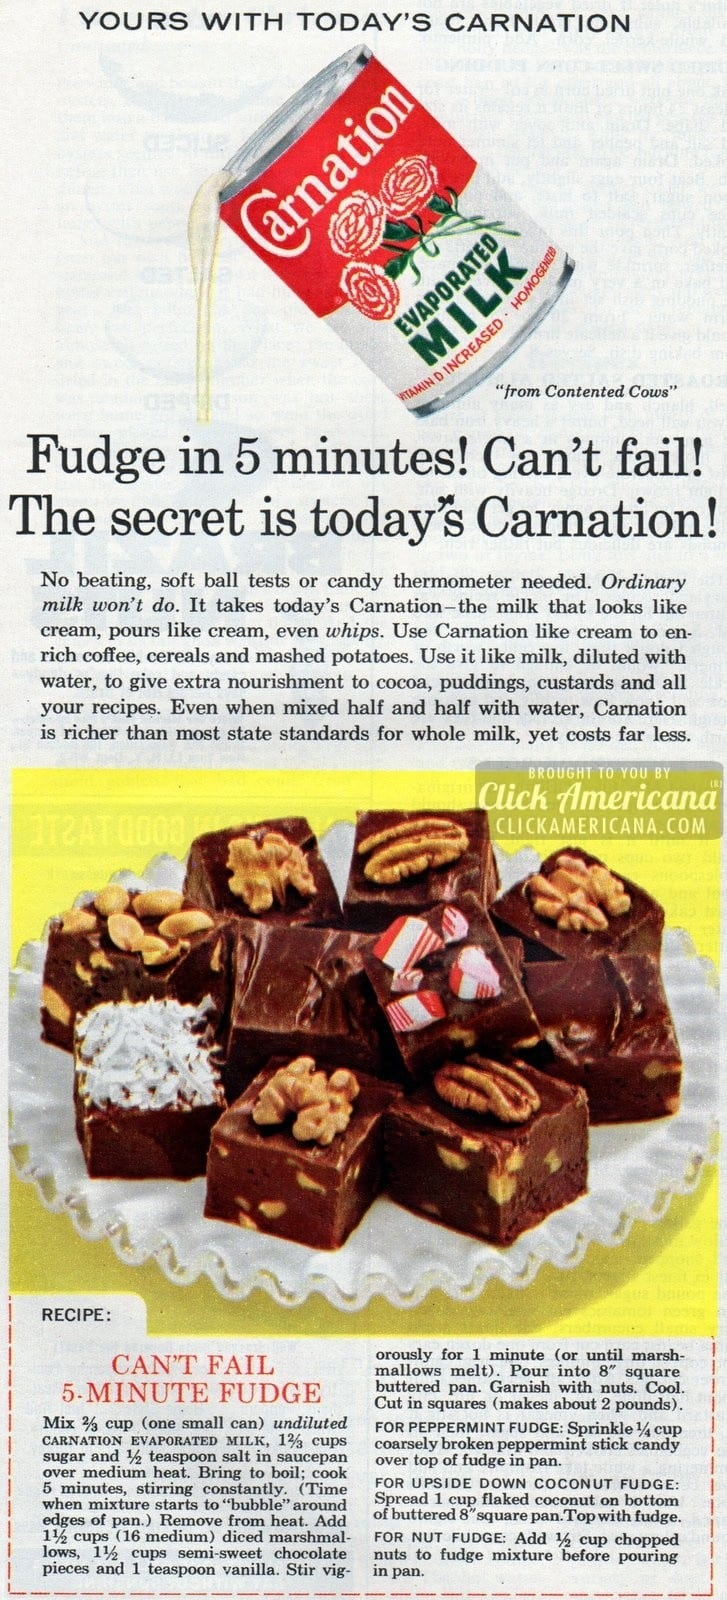 Can't fail 5-minute fudge recipe (1961)